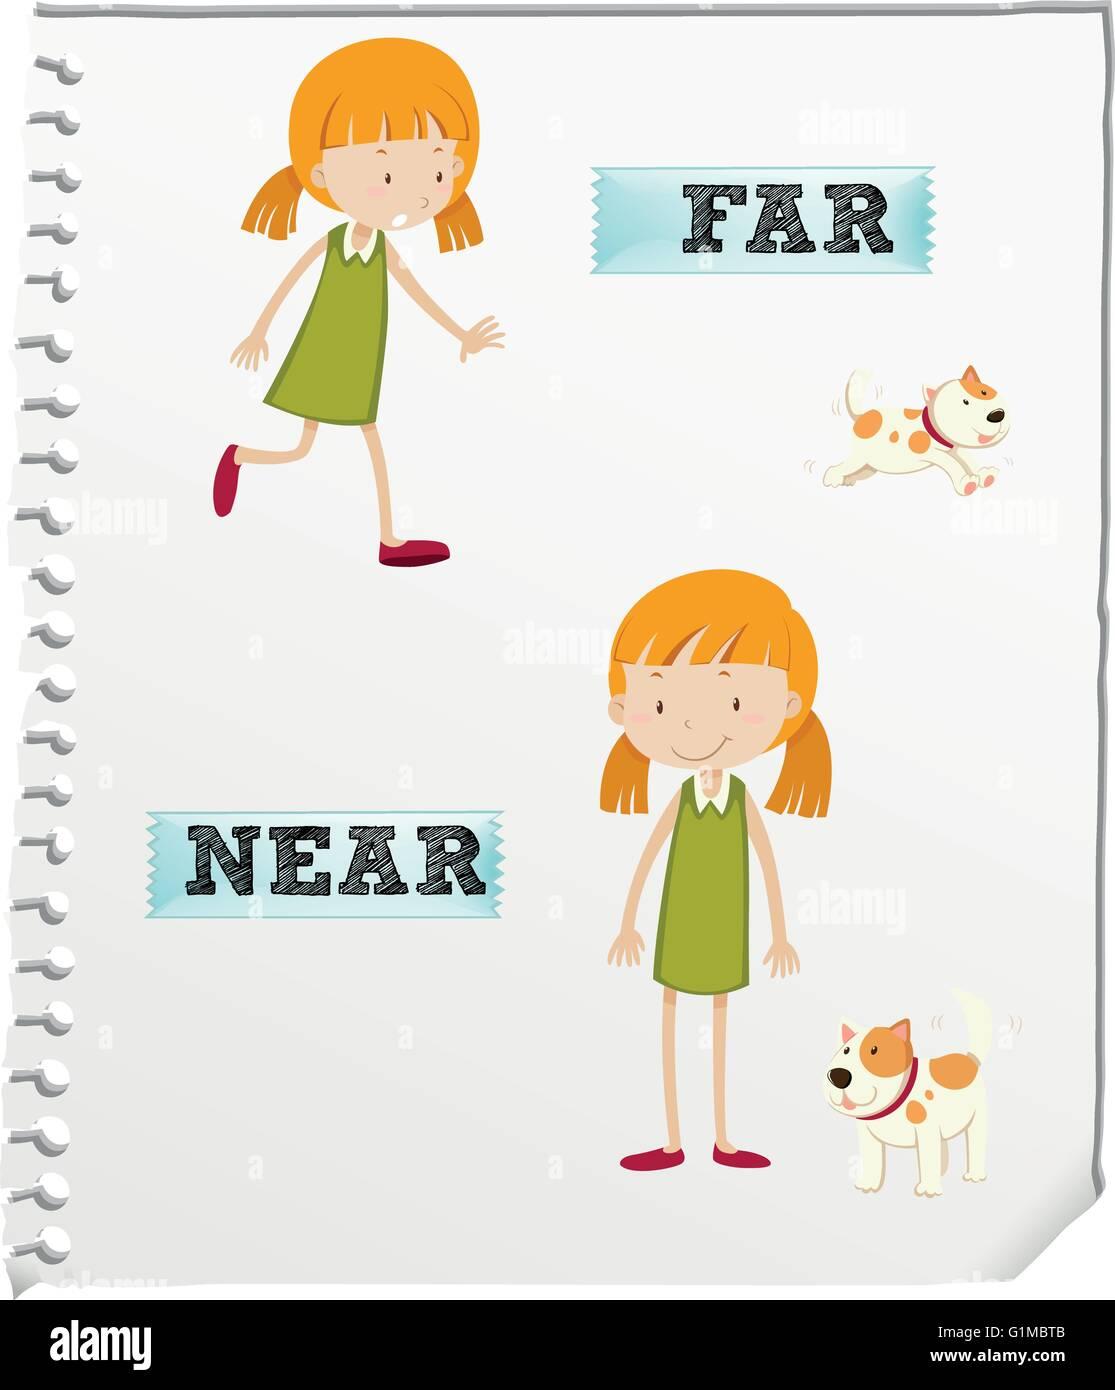 Opposite Adjectives Far And Near Illustration Stock Vector Art Amp Illustration Vector Image